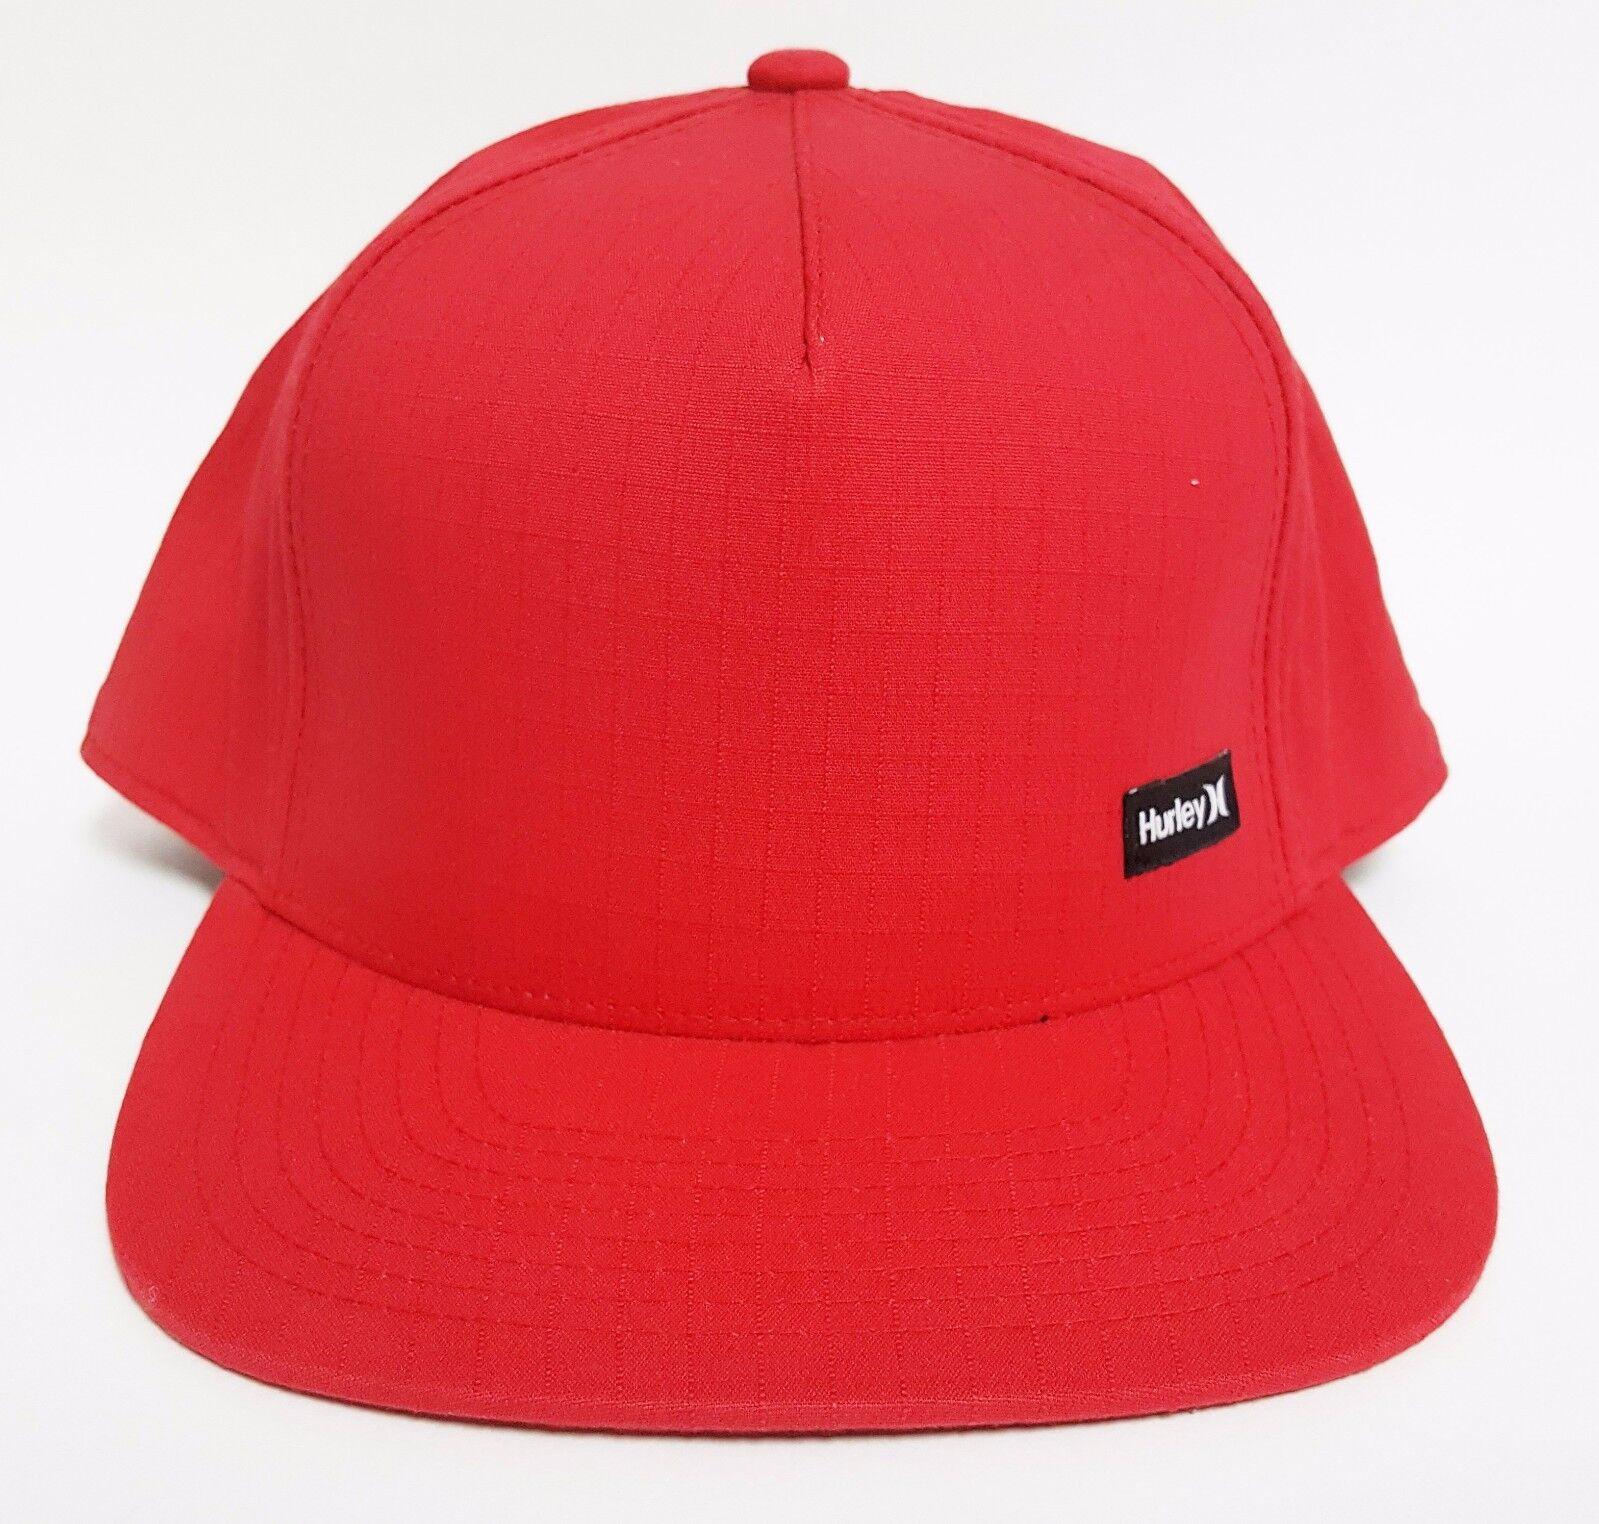 buy online ac044 bf033 ... czech hurley ripstop 110 fllex tech yopoong snapback cap hat adjustable  f0d68 7b29f